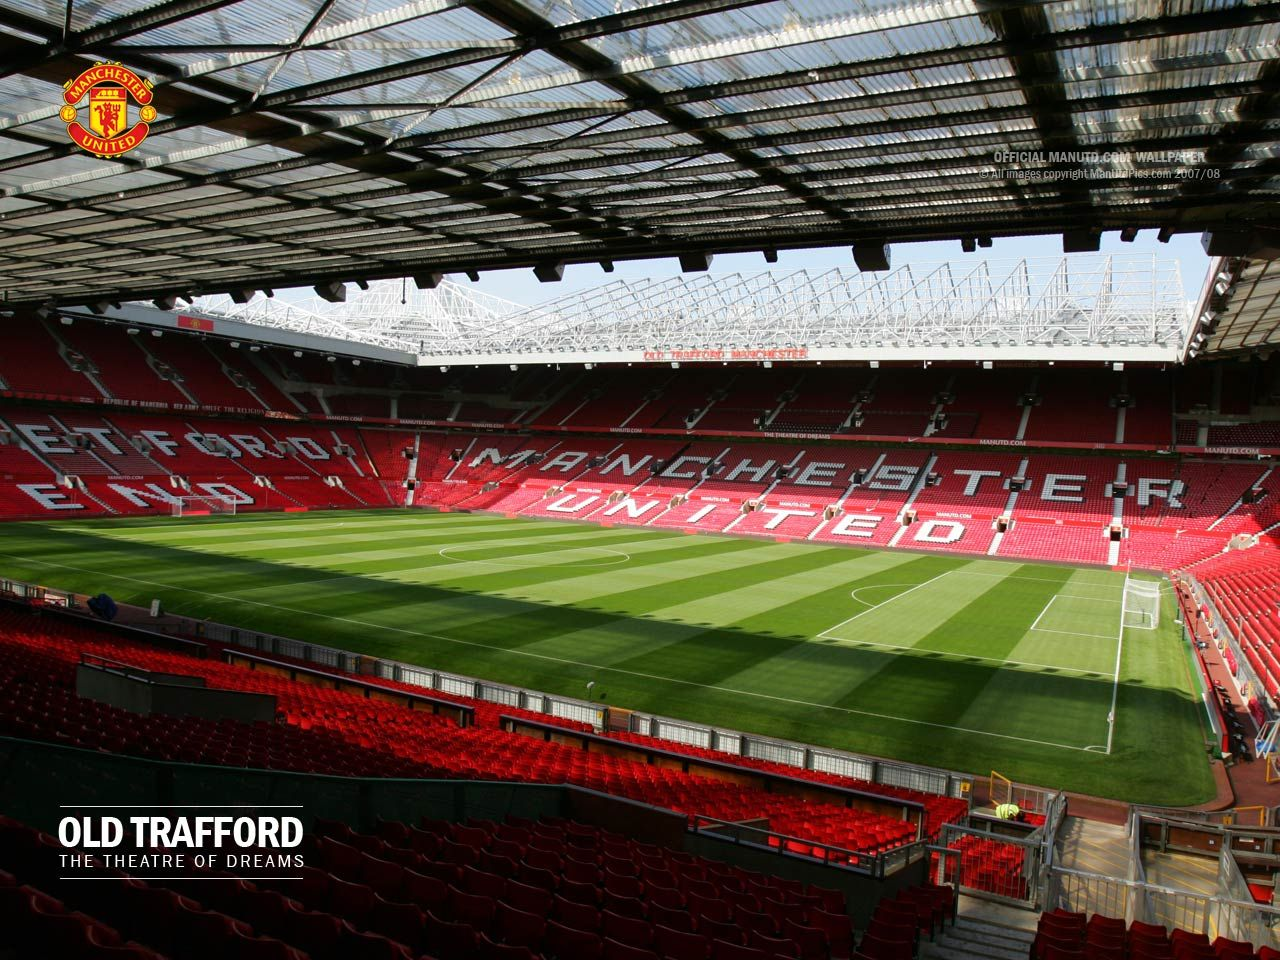 Manchester United Old Trafford Stadium   Wallpup.com